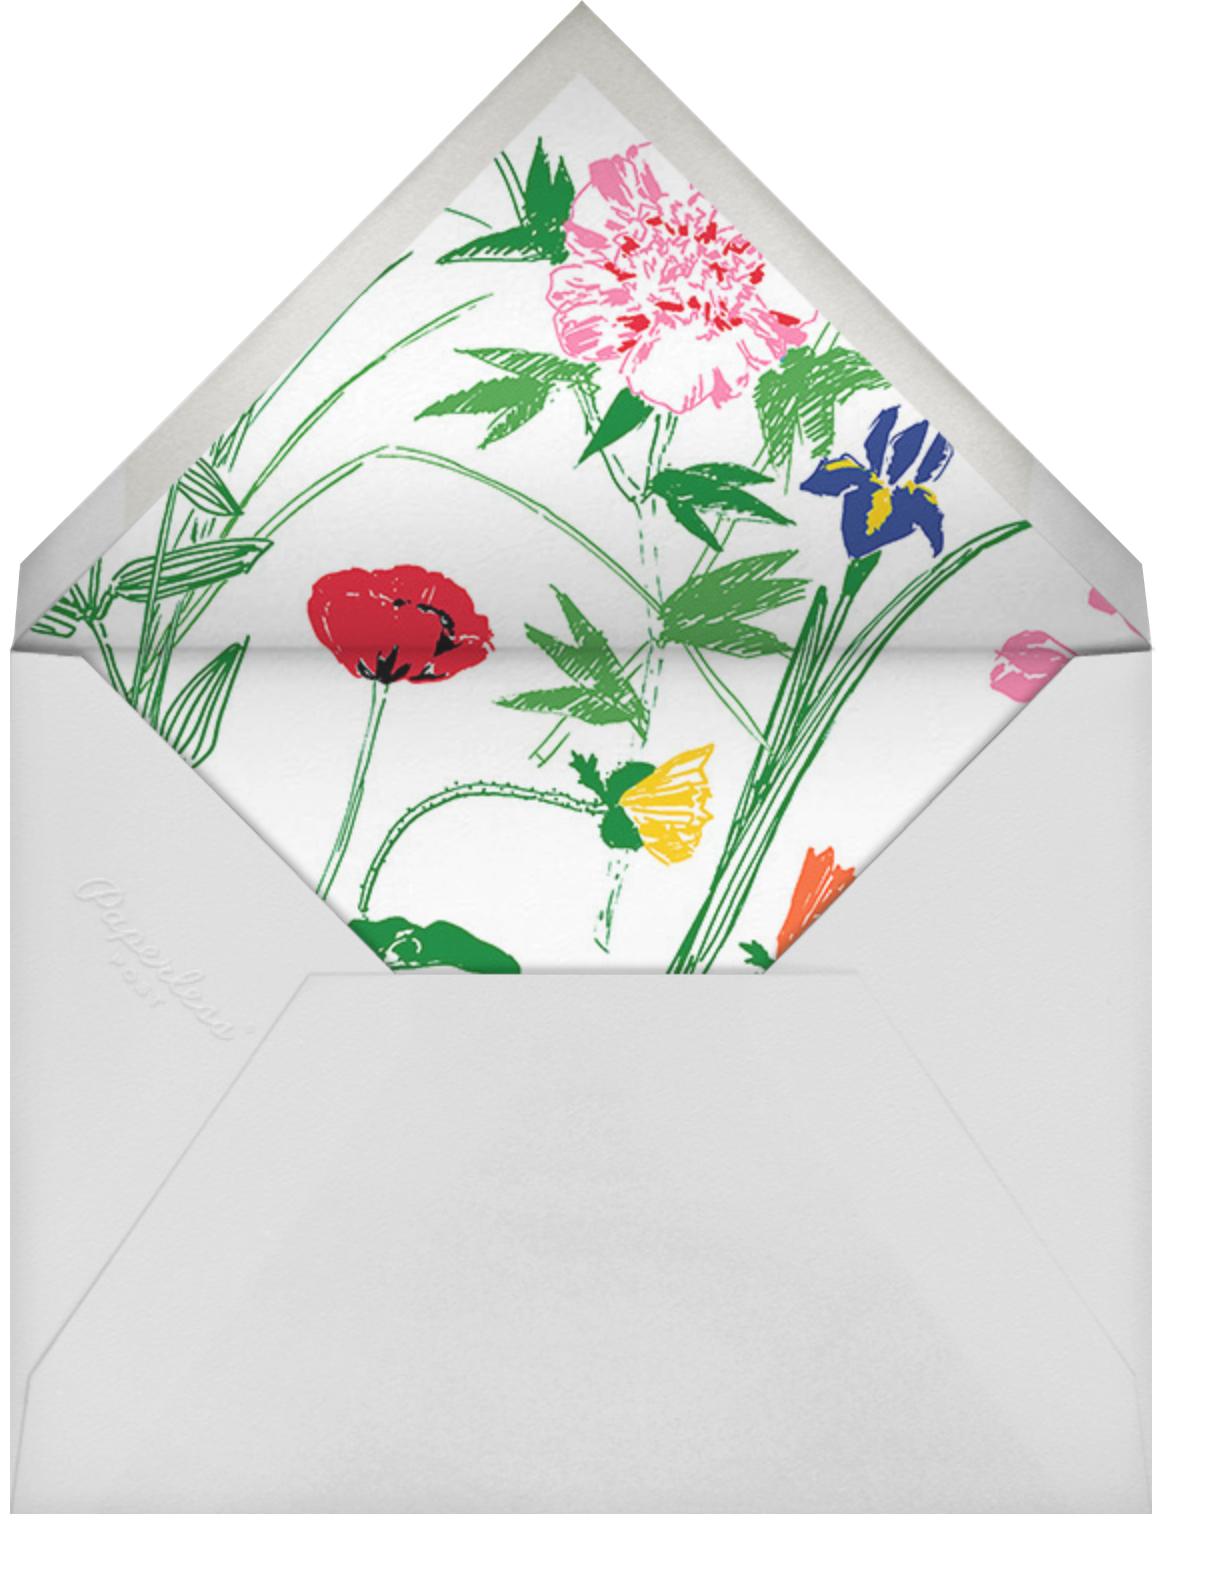 Puutarhakutsut (Tall) - Green - Marimekko - Baby shower - envelope back